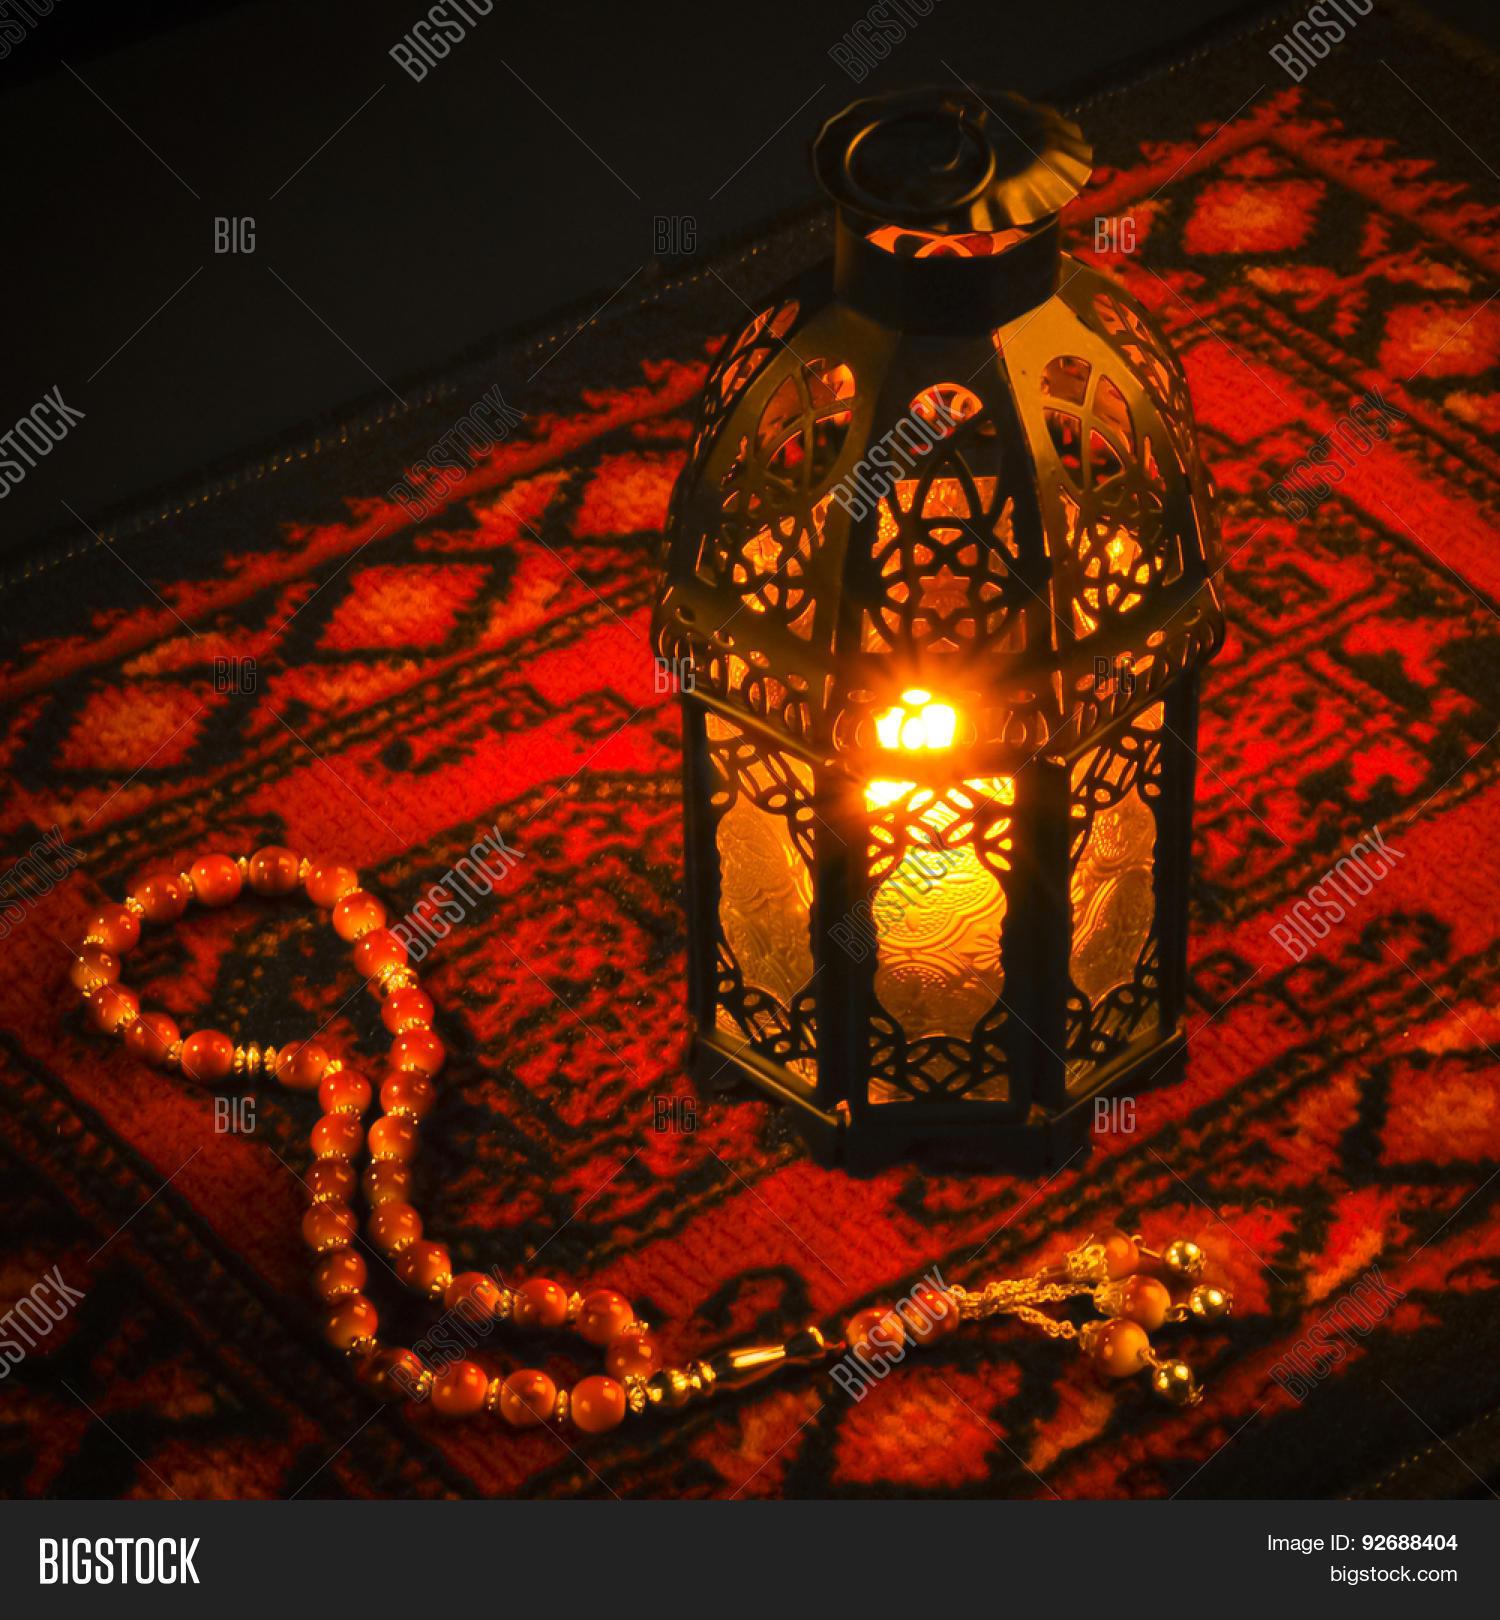 Ramadan Greeting Card Image & Photo (Free Trial)